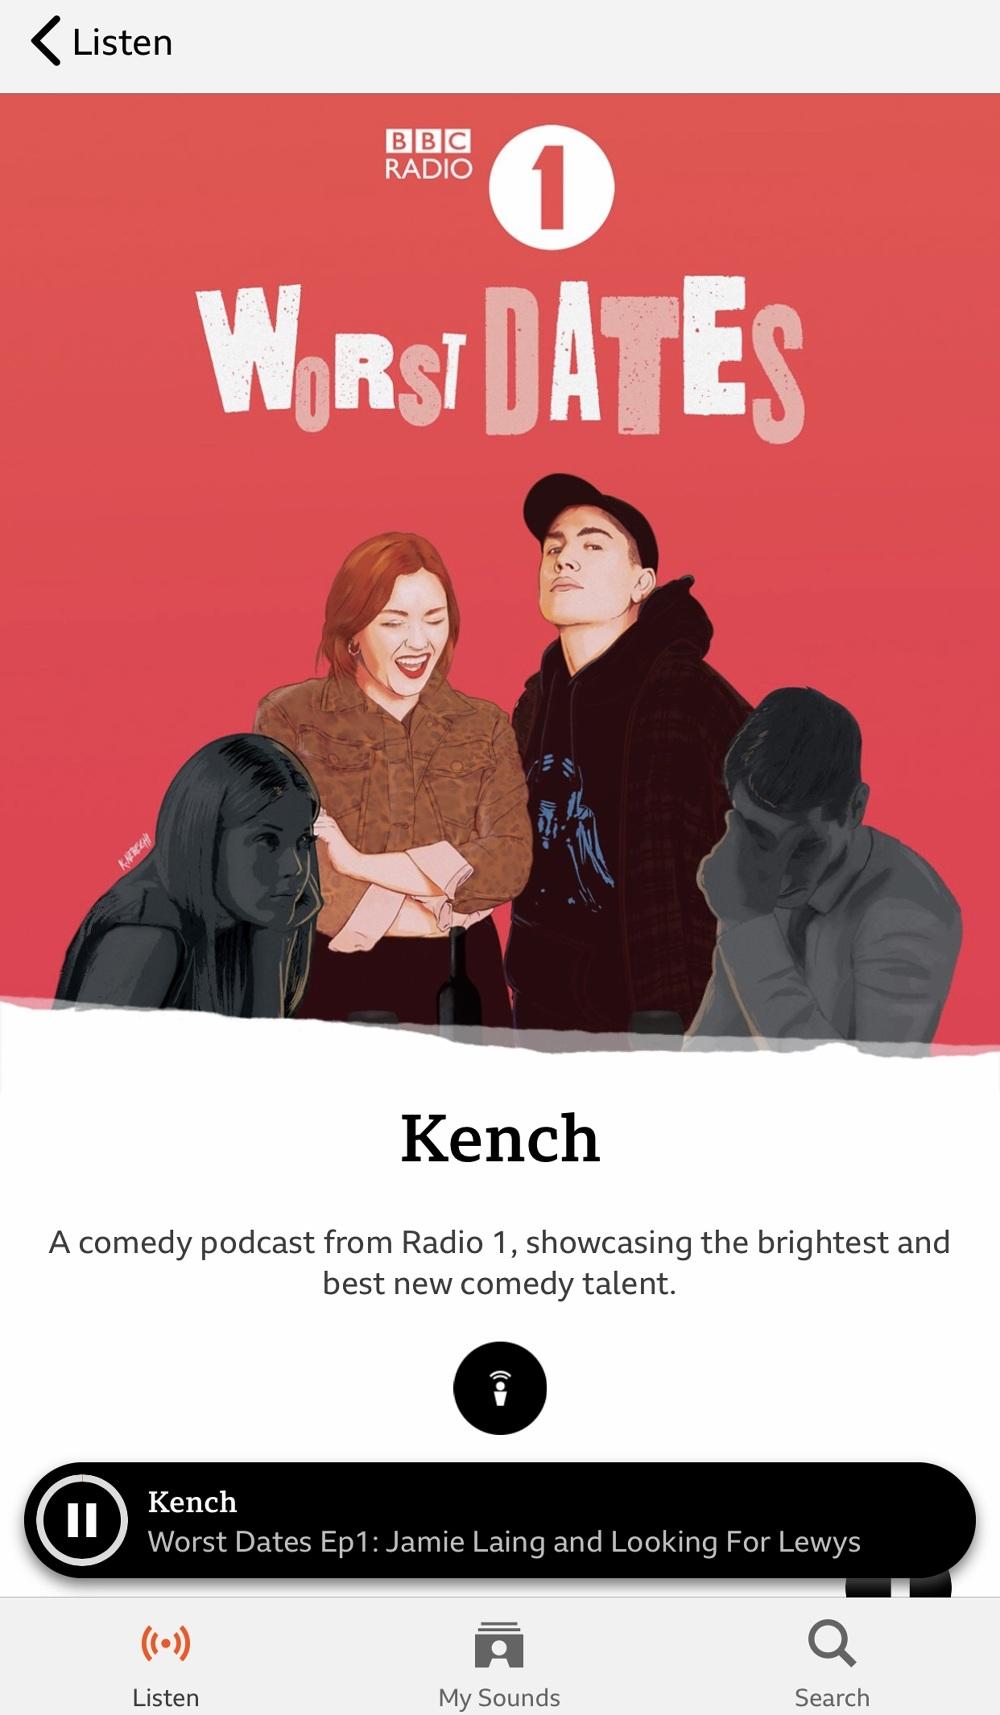 BBC Worst Dates - Kingsley Nebechi Creative Director / Illustrator